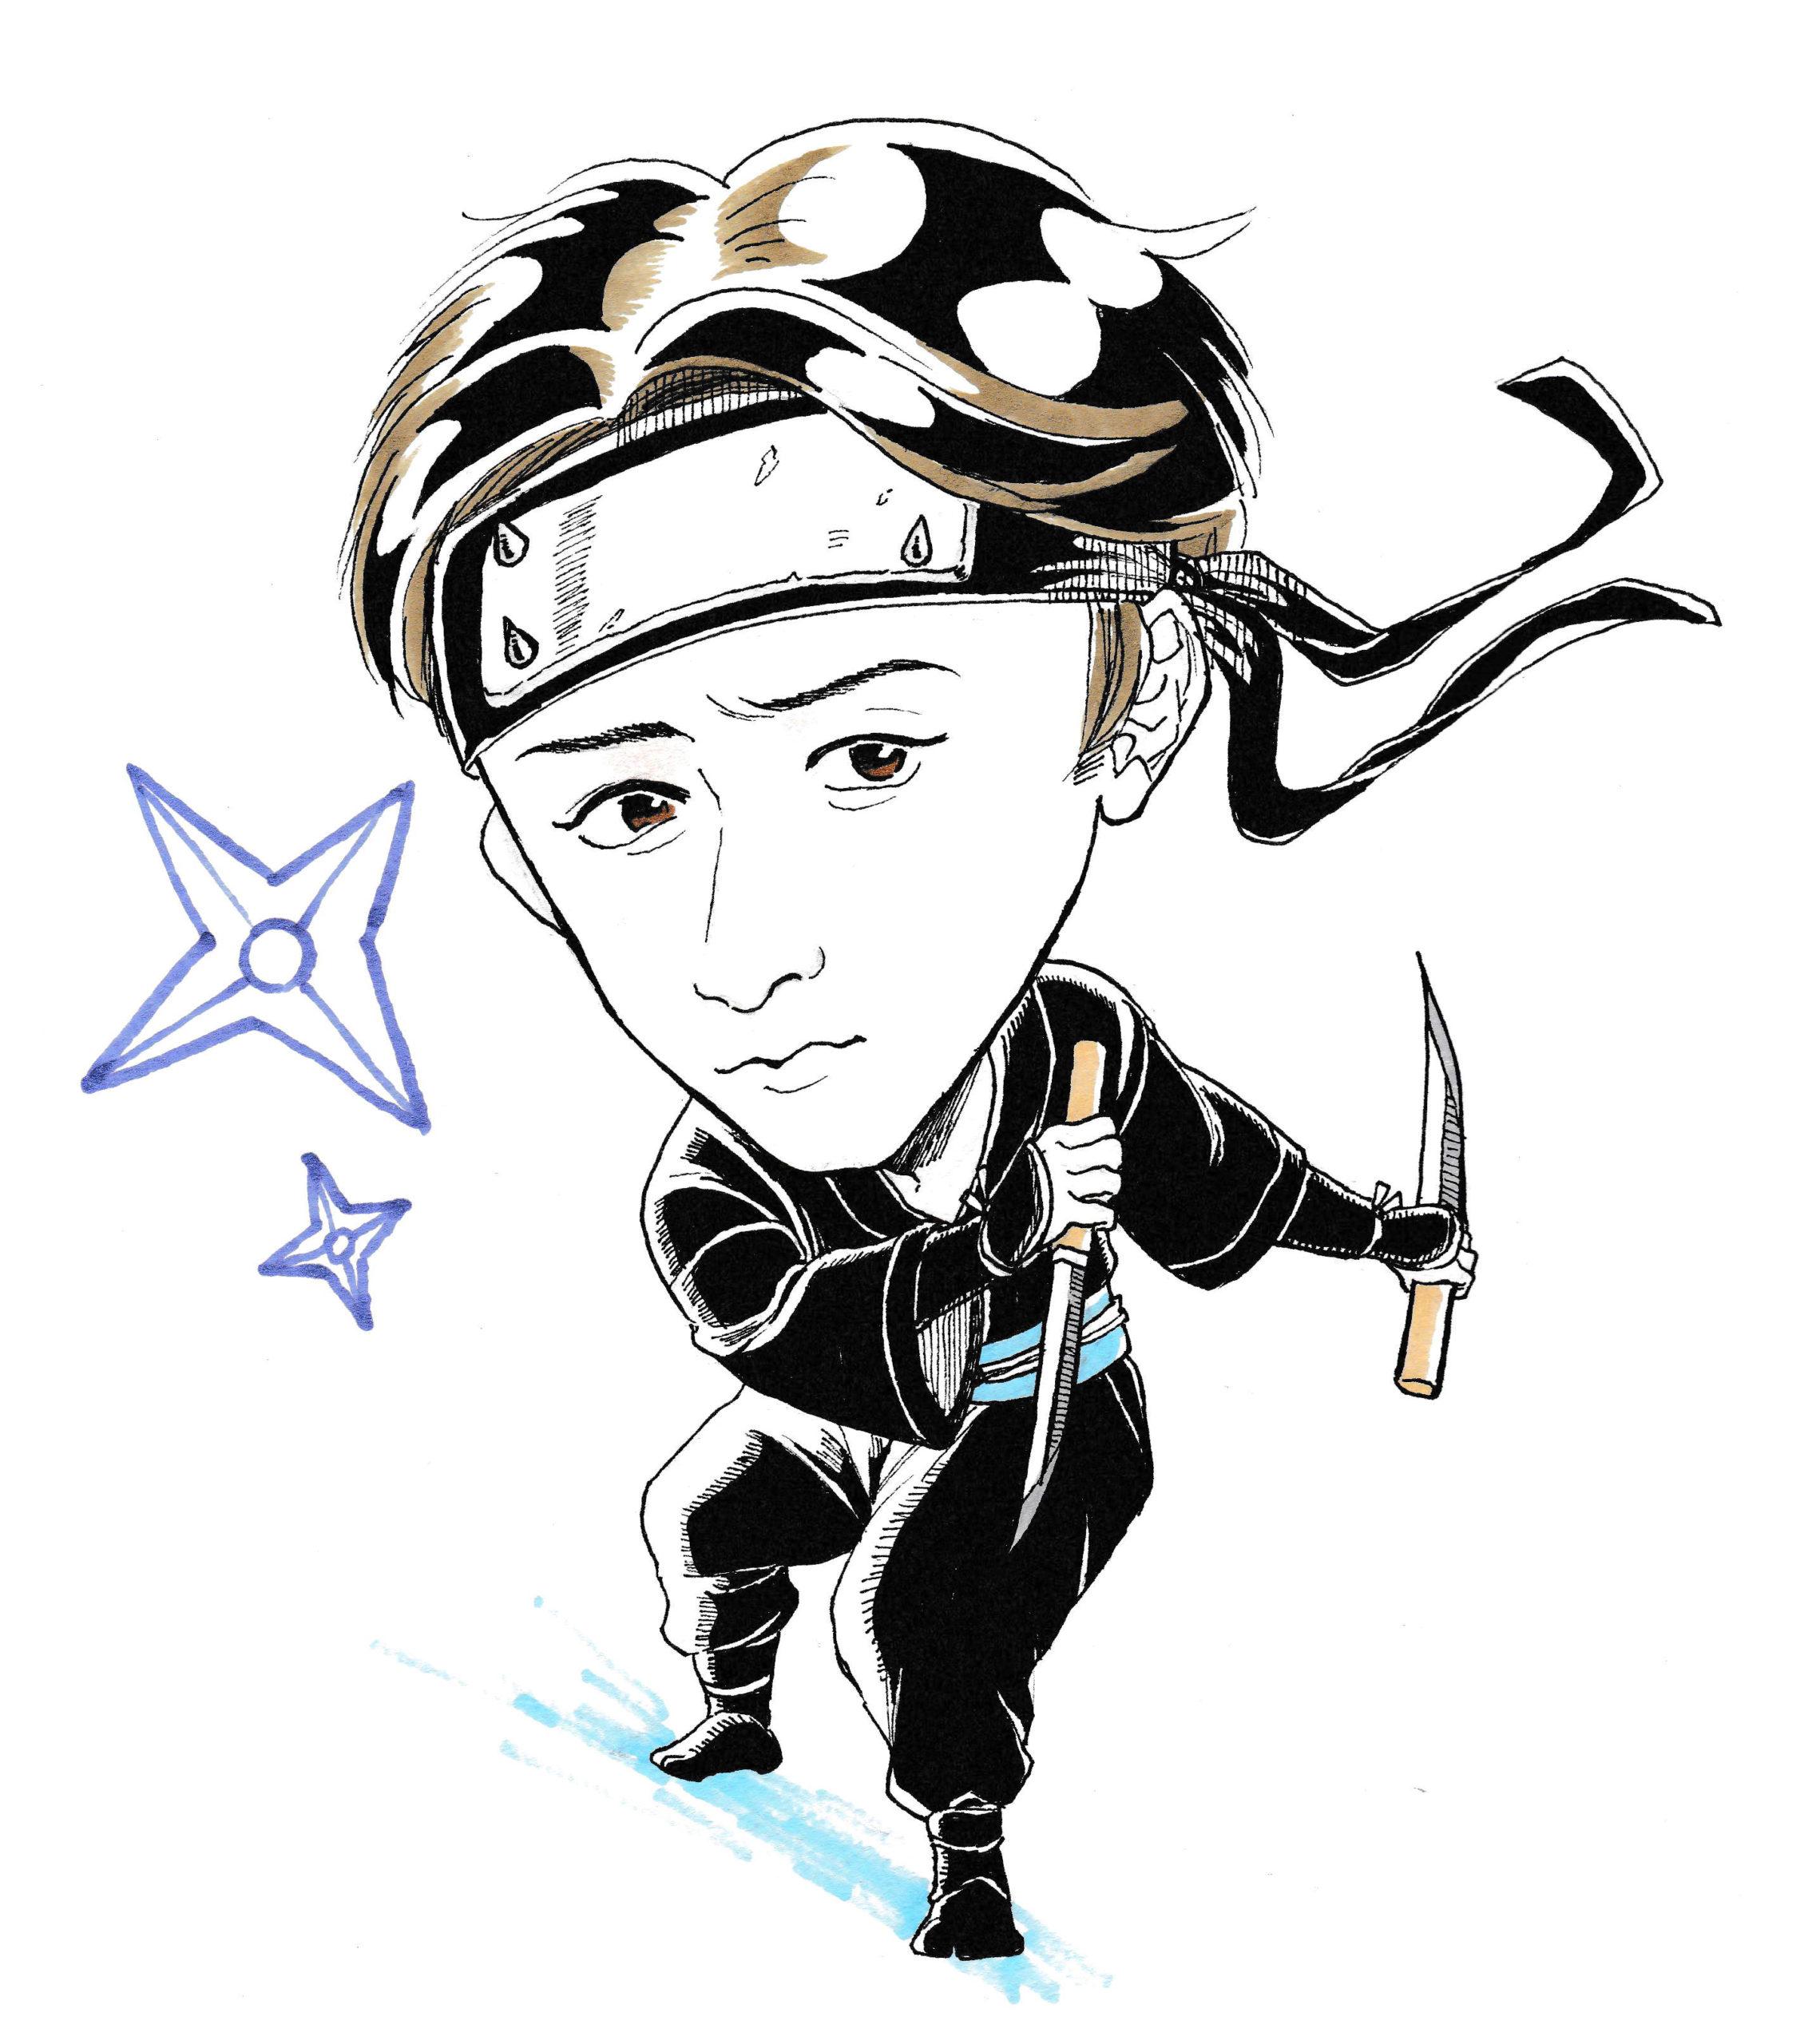 2月22日は忍者の日!忍者似顔絵大会開催!!